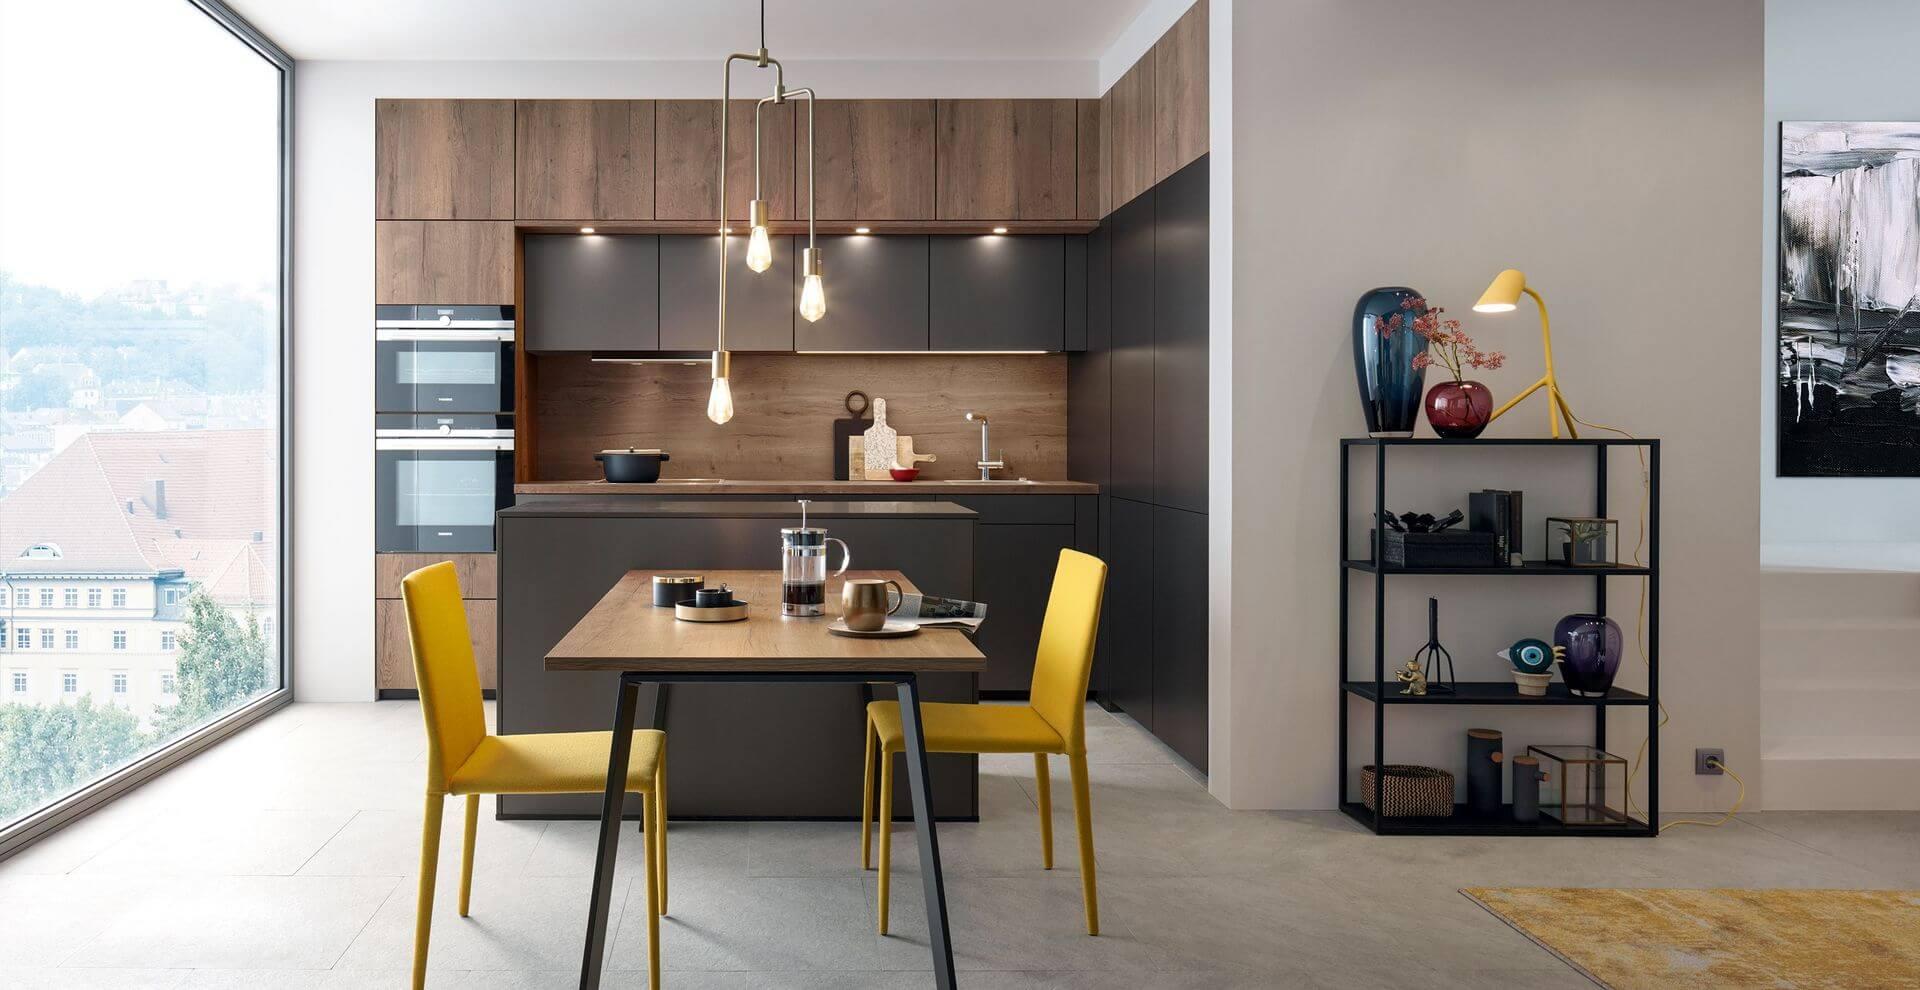 Kuchyňa CORTINA - Elegantná kuchyňa v meste | Schuller C